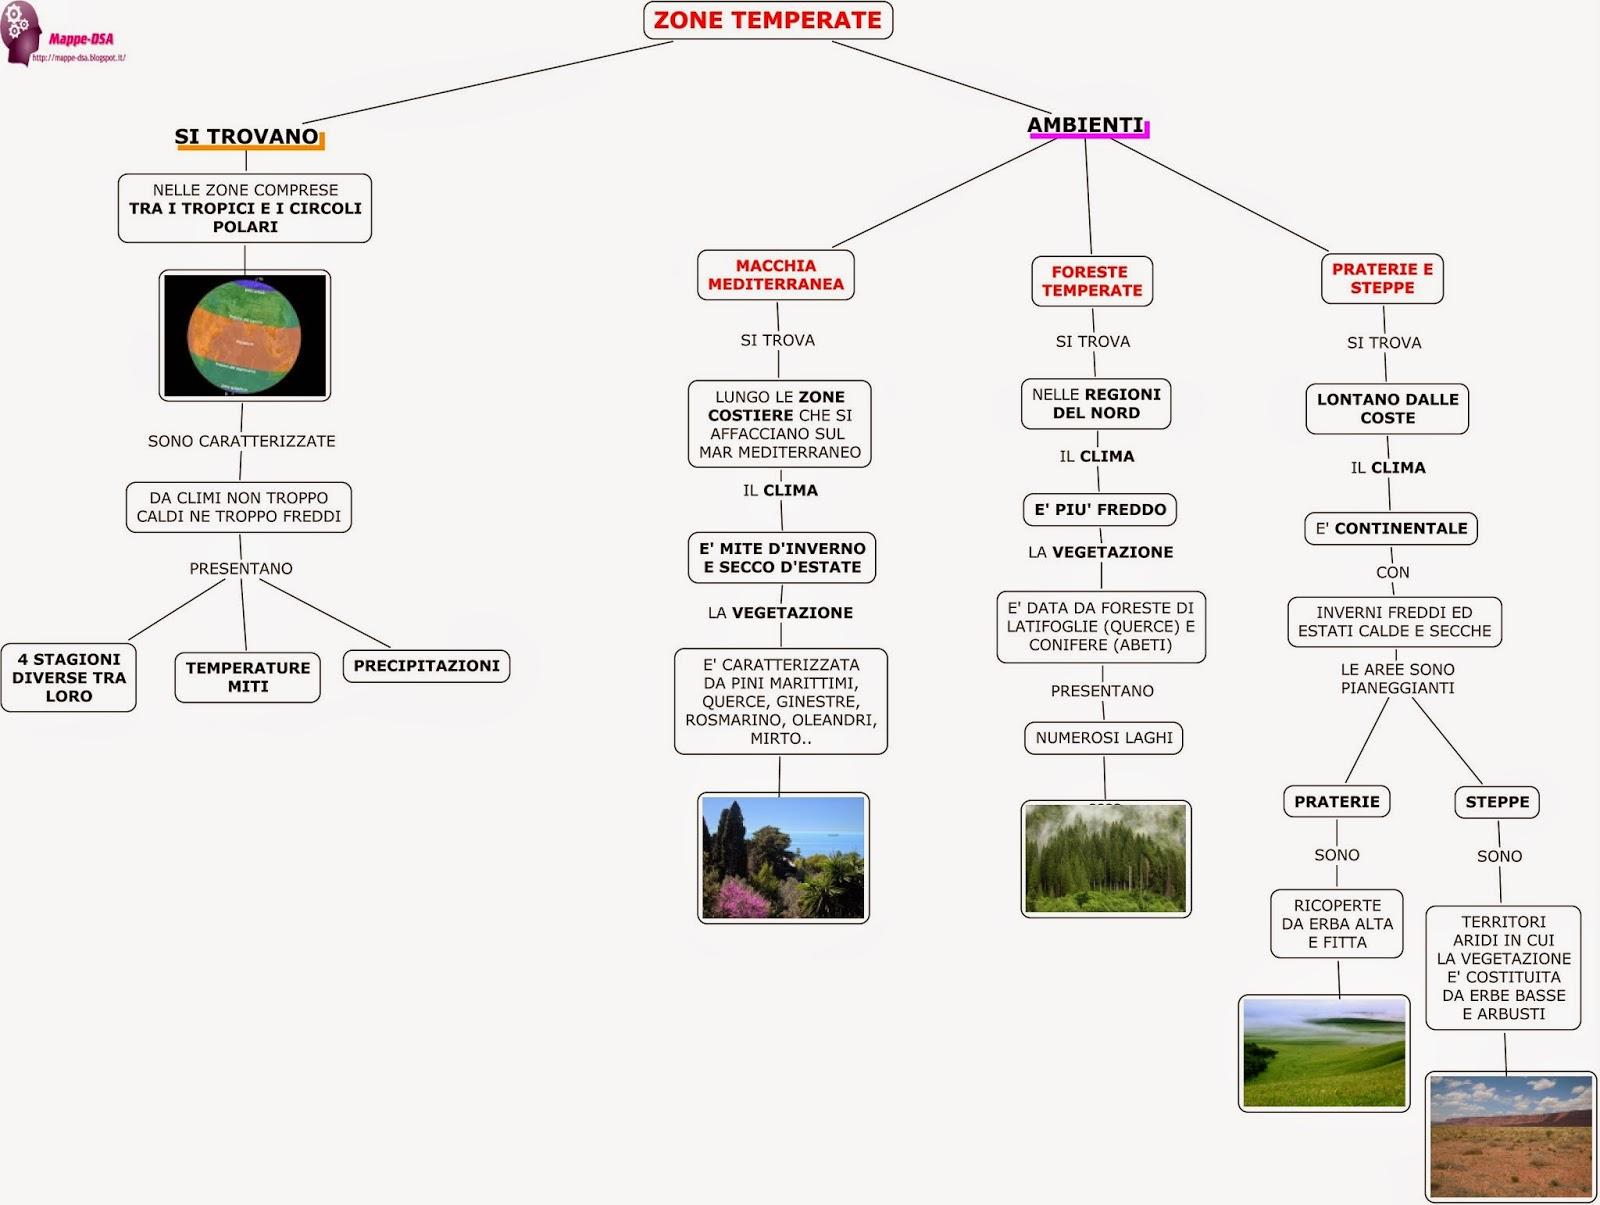 mappa schema geografia dsa zone temperate macchia mediterranea foresta conifere latifoglie prateria steppa